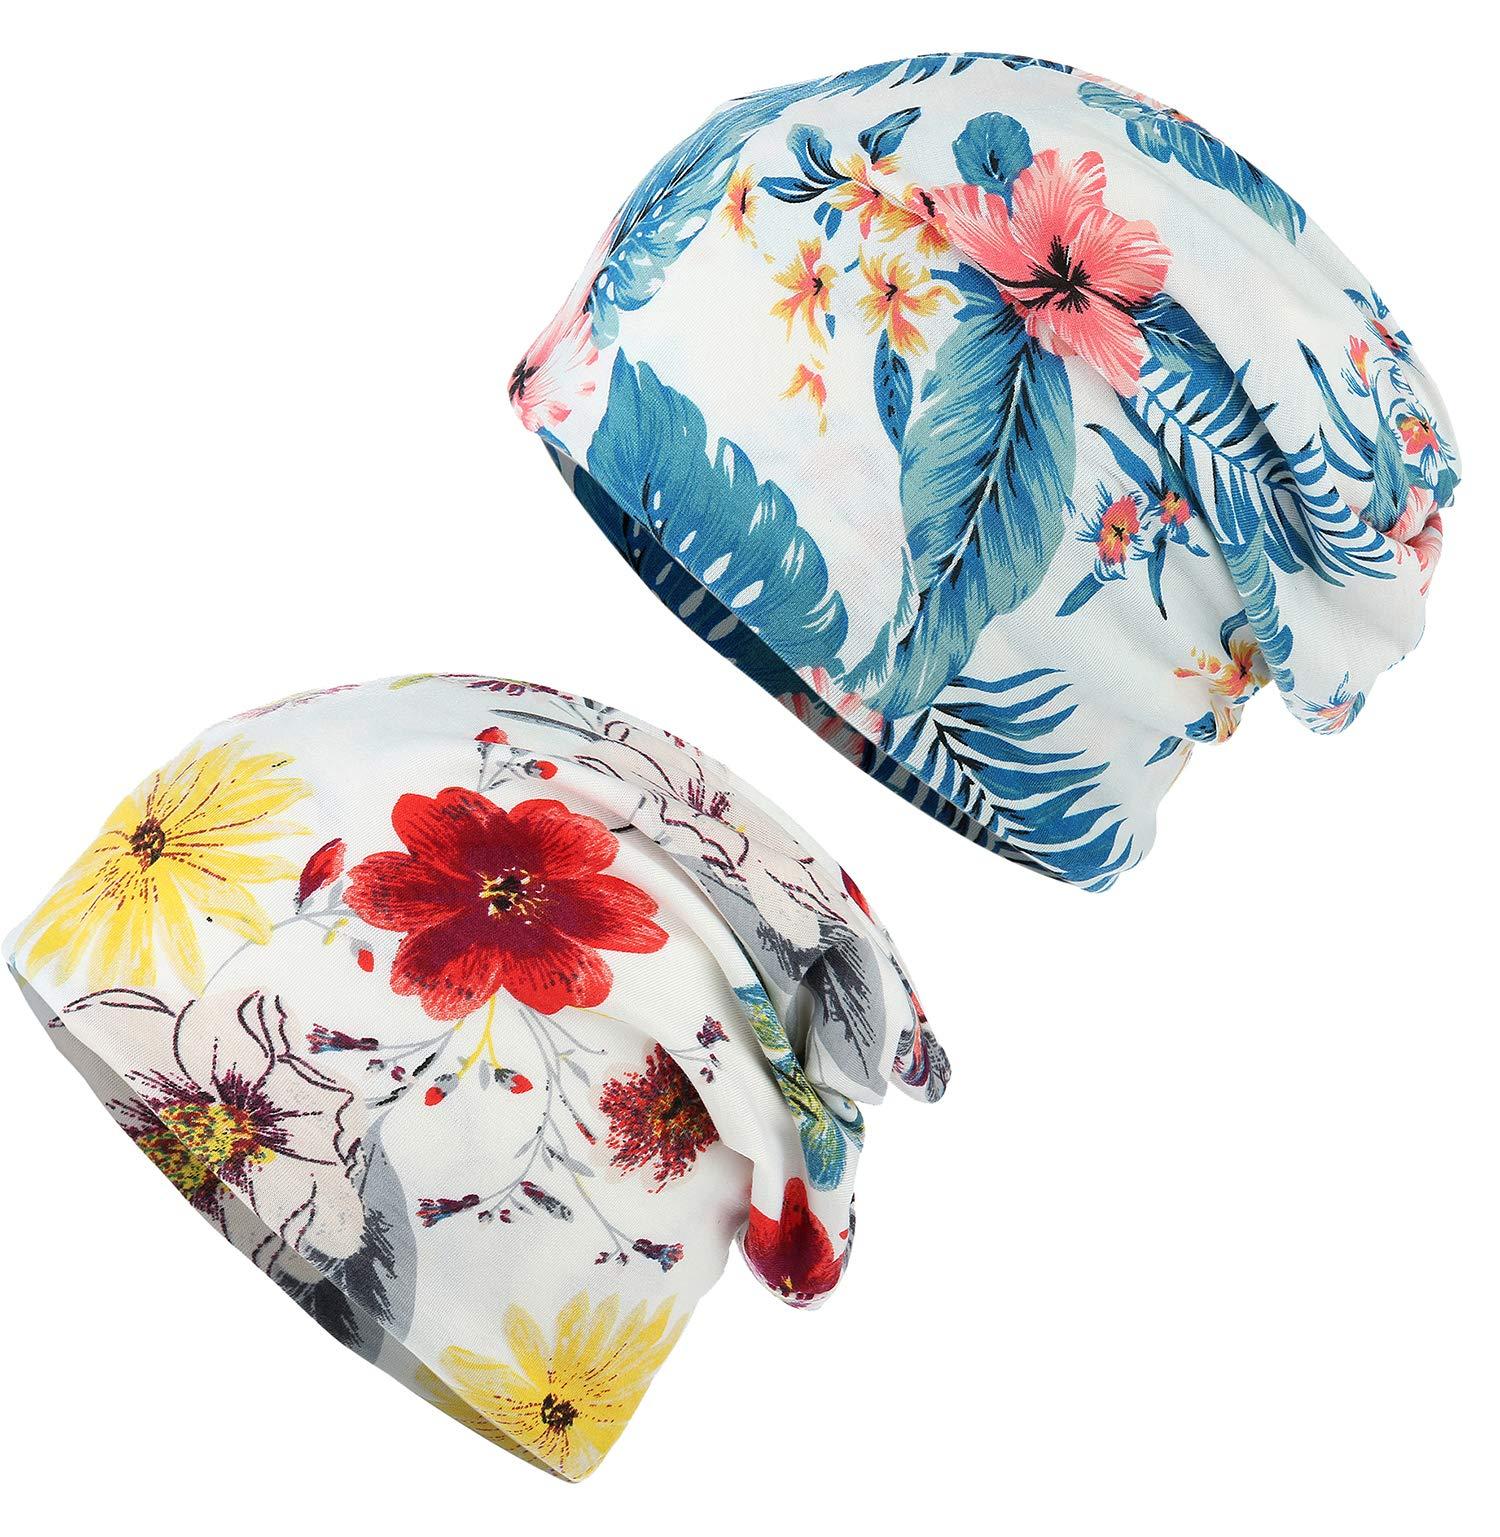 HONENNA Flower Printed Cotton Beanie Women Turban Headband Chemo Cap (2 Pack Set 2)